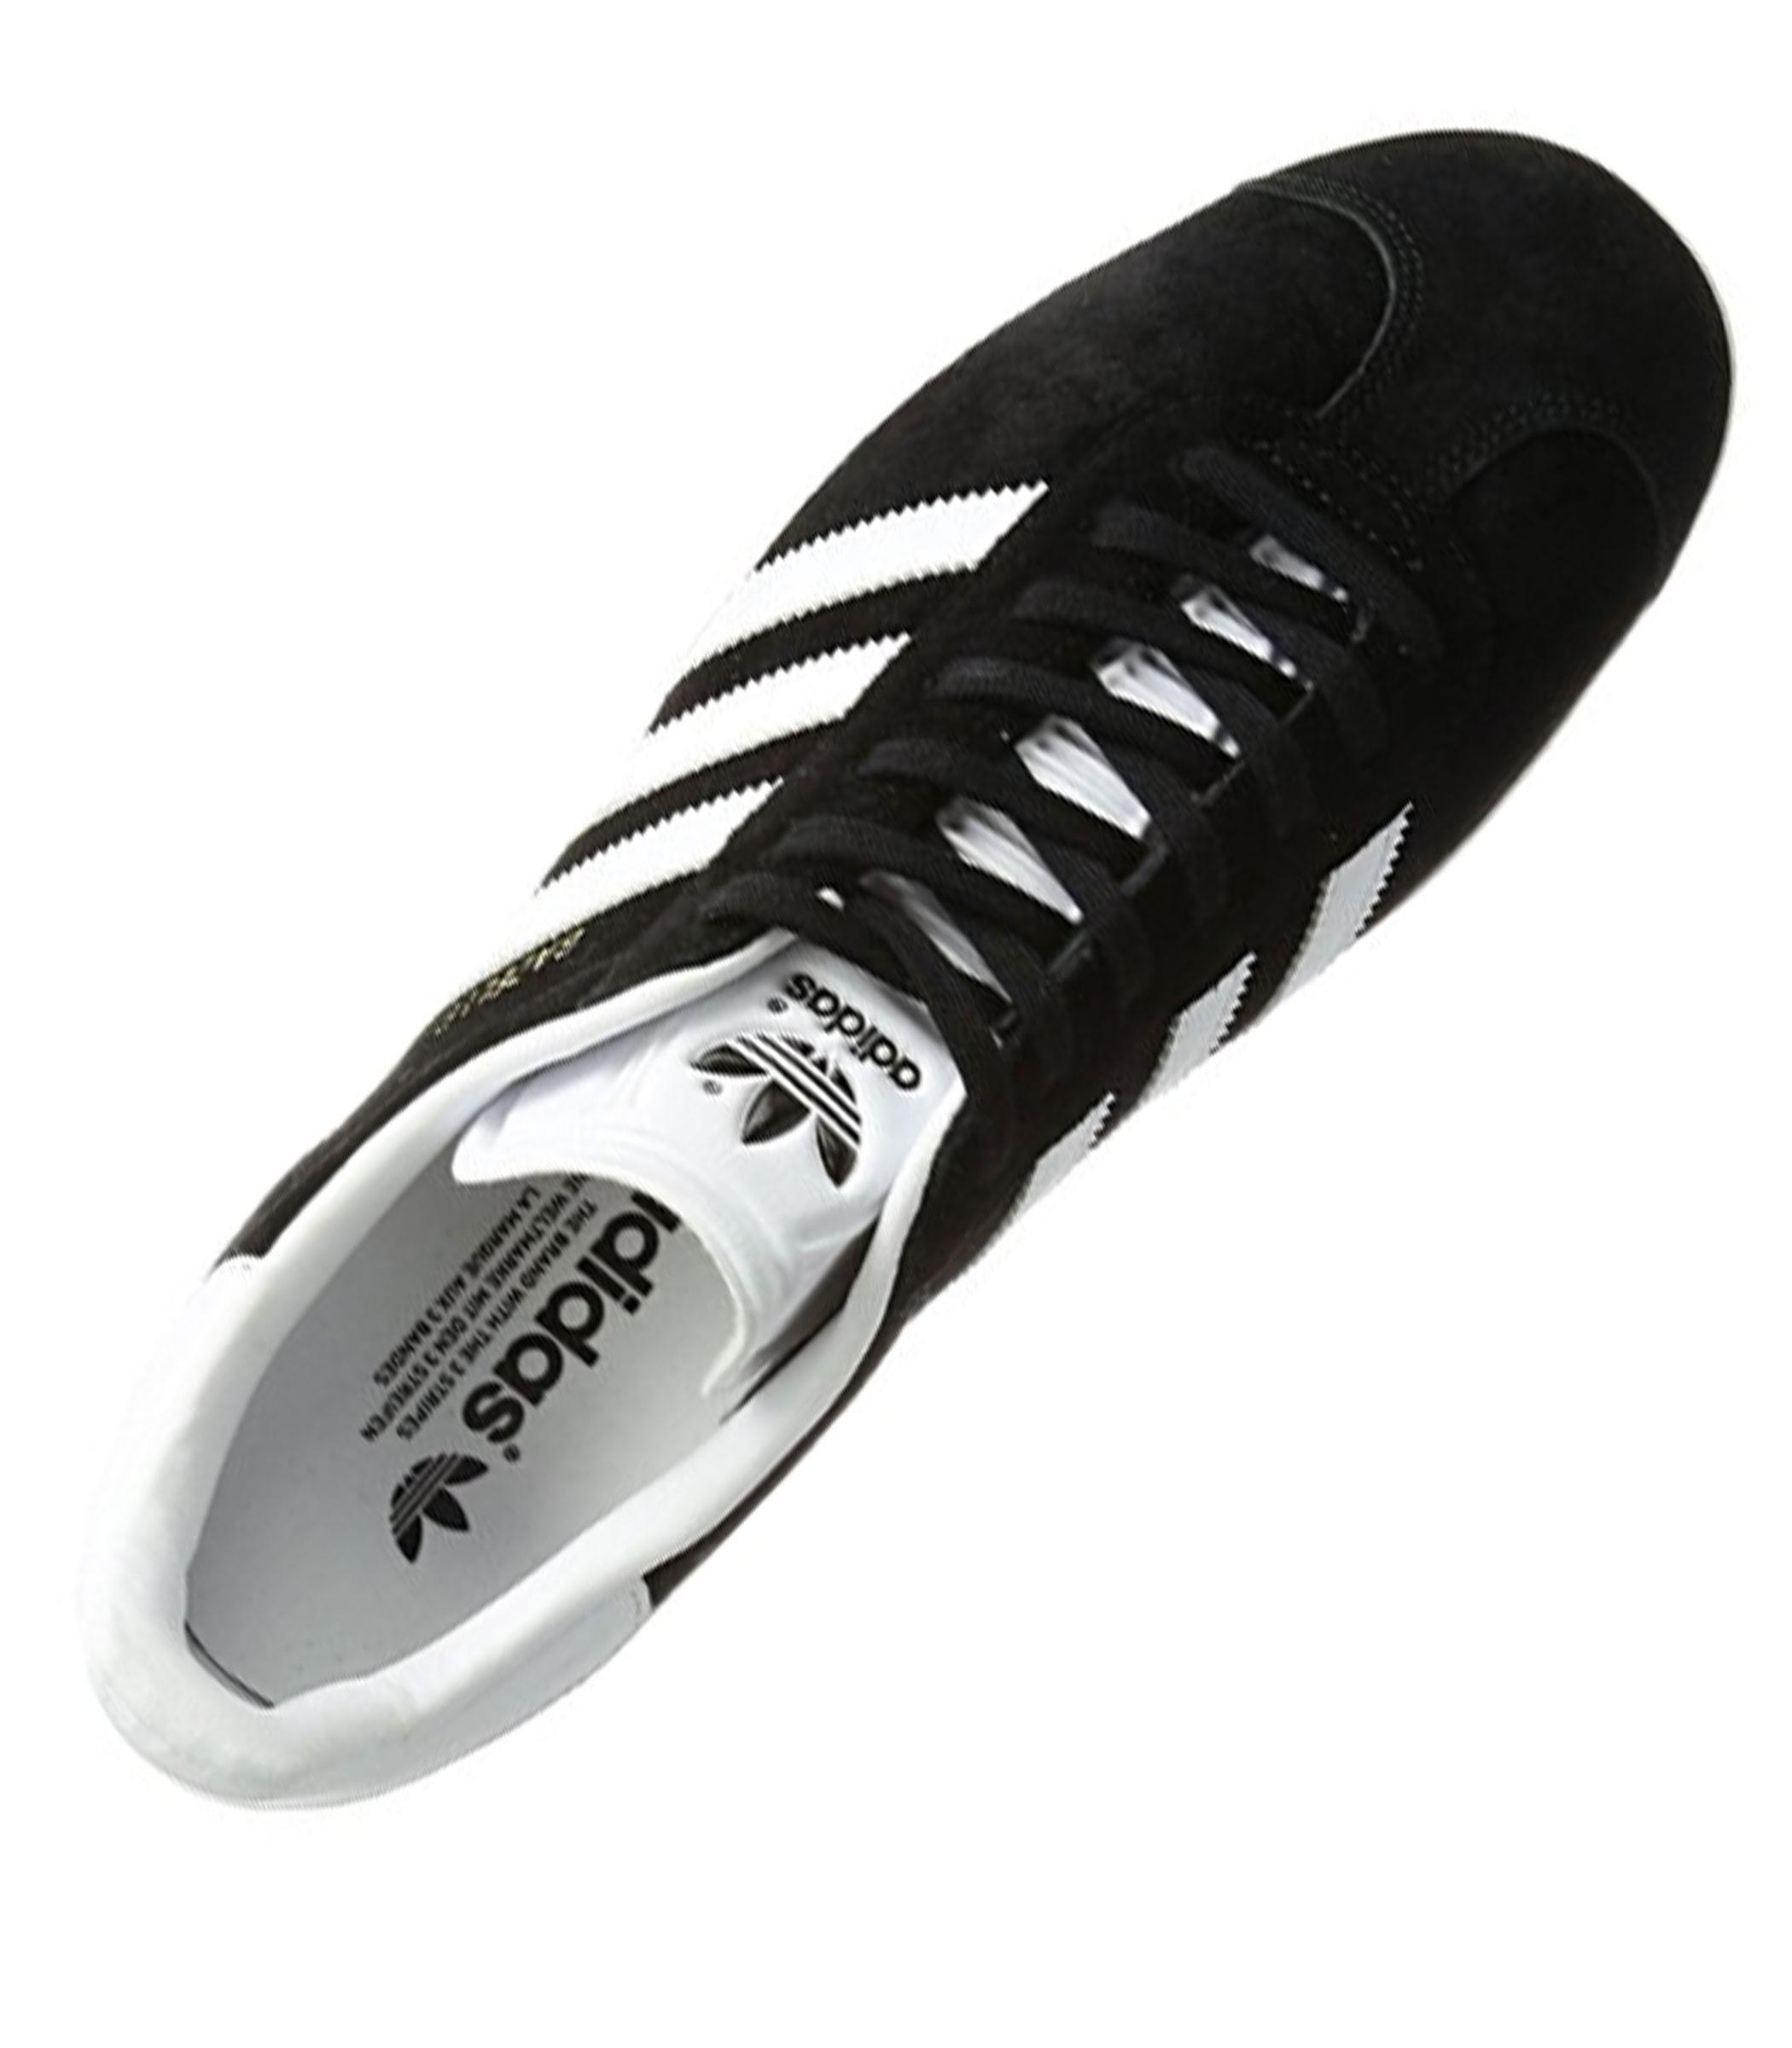 info for 3c22b 17871 BB5476 Scarpe da ginnastica Adidas Gazelle - Uomo rif.